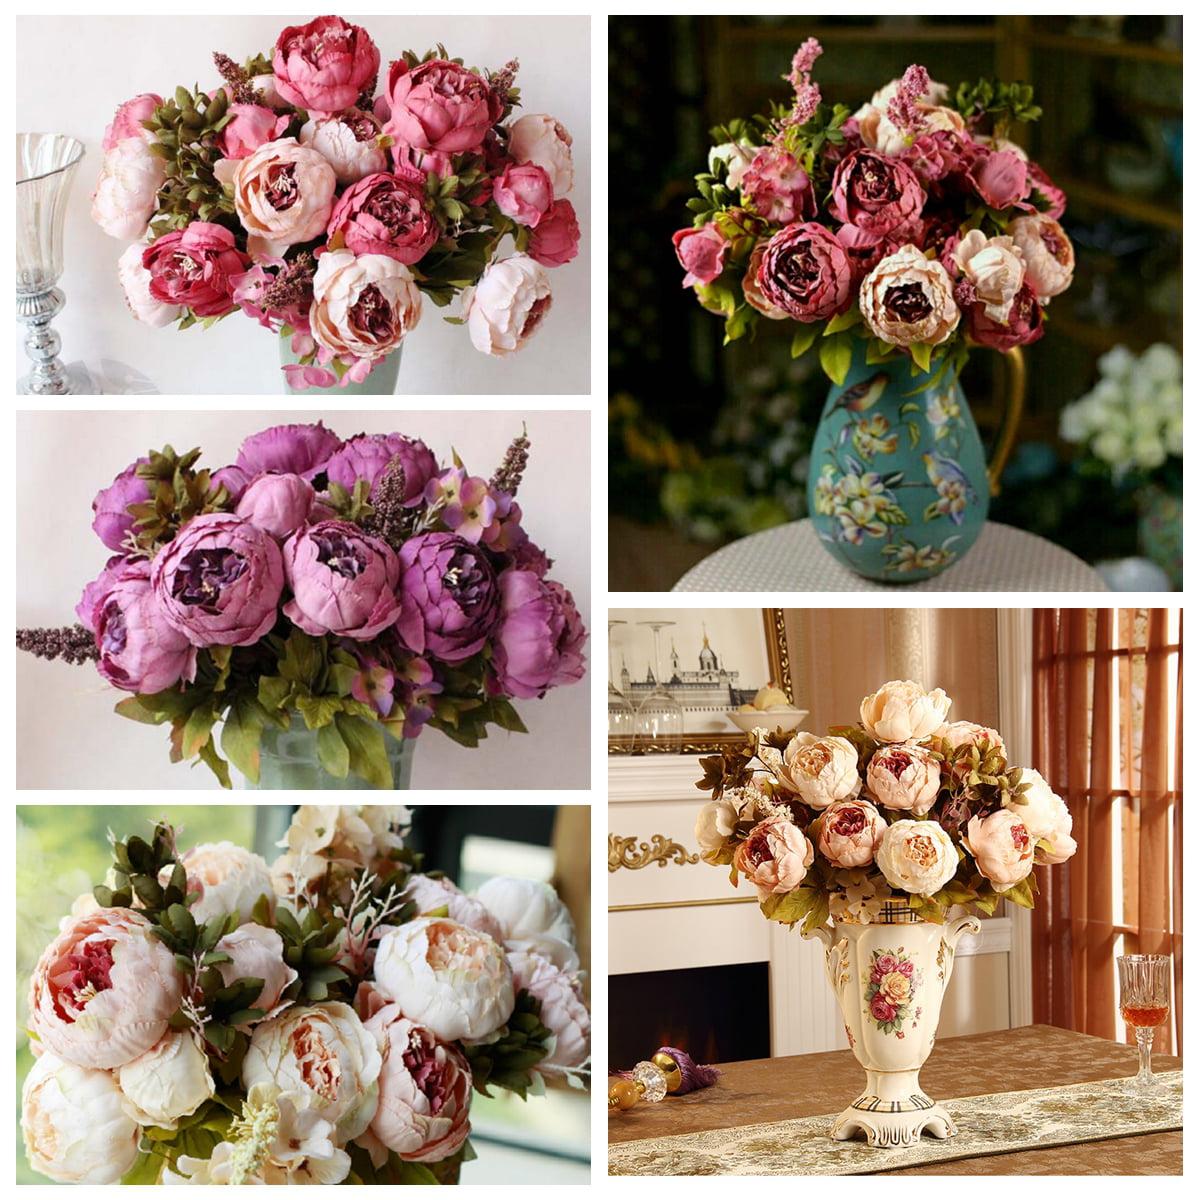 1 Bouquet Vintage Artificial Peony Silk Flowers 6 Heads Bouquet Wedding Bridal Party Garden Decoration